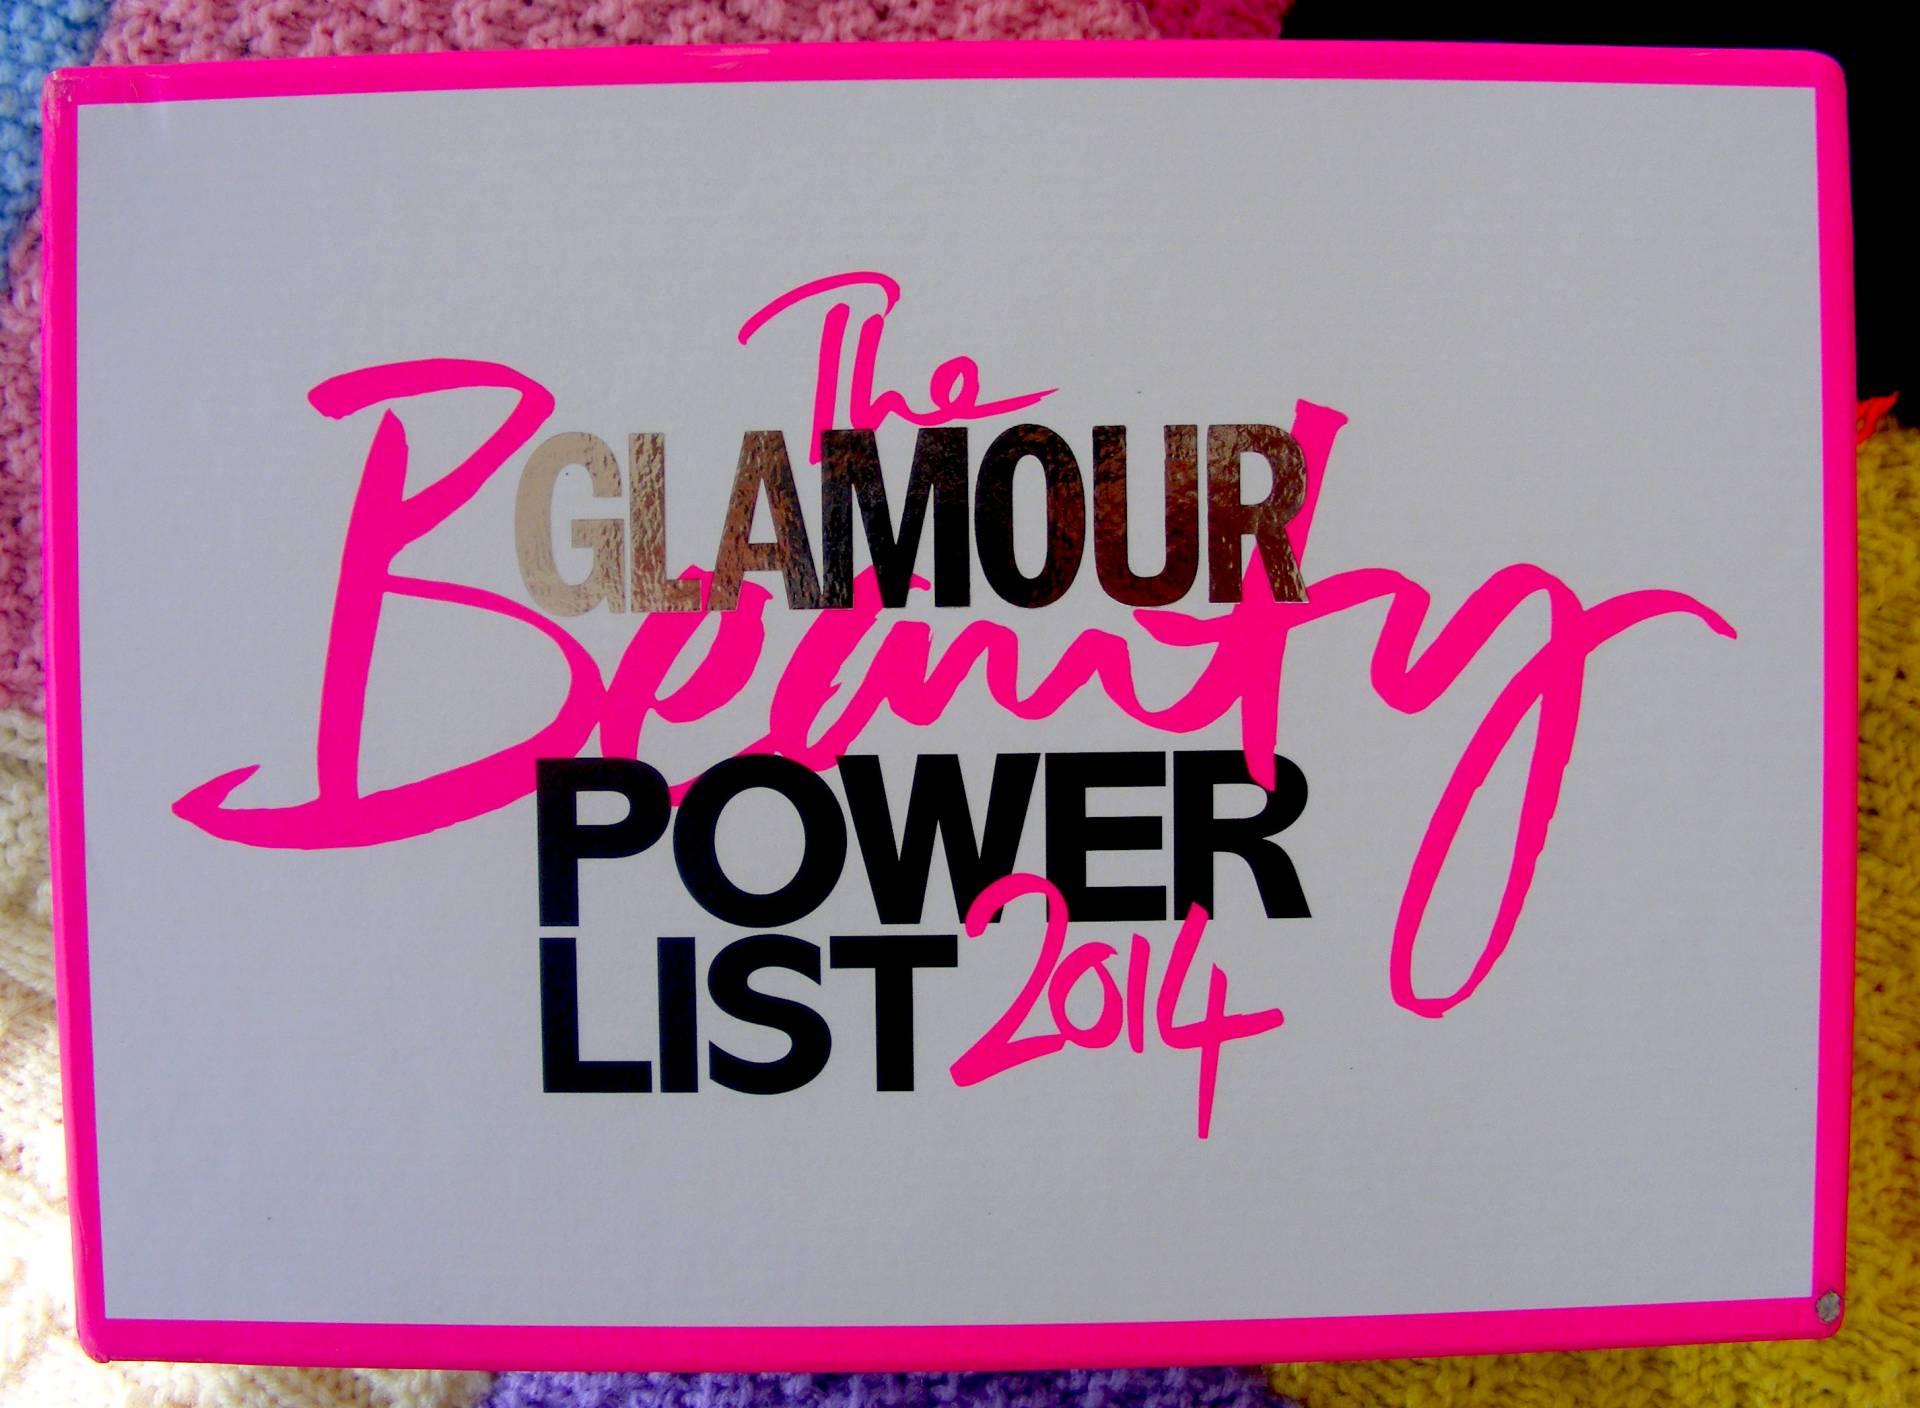 Latest in Beauty Glamour Beauty Power List